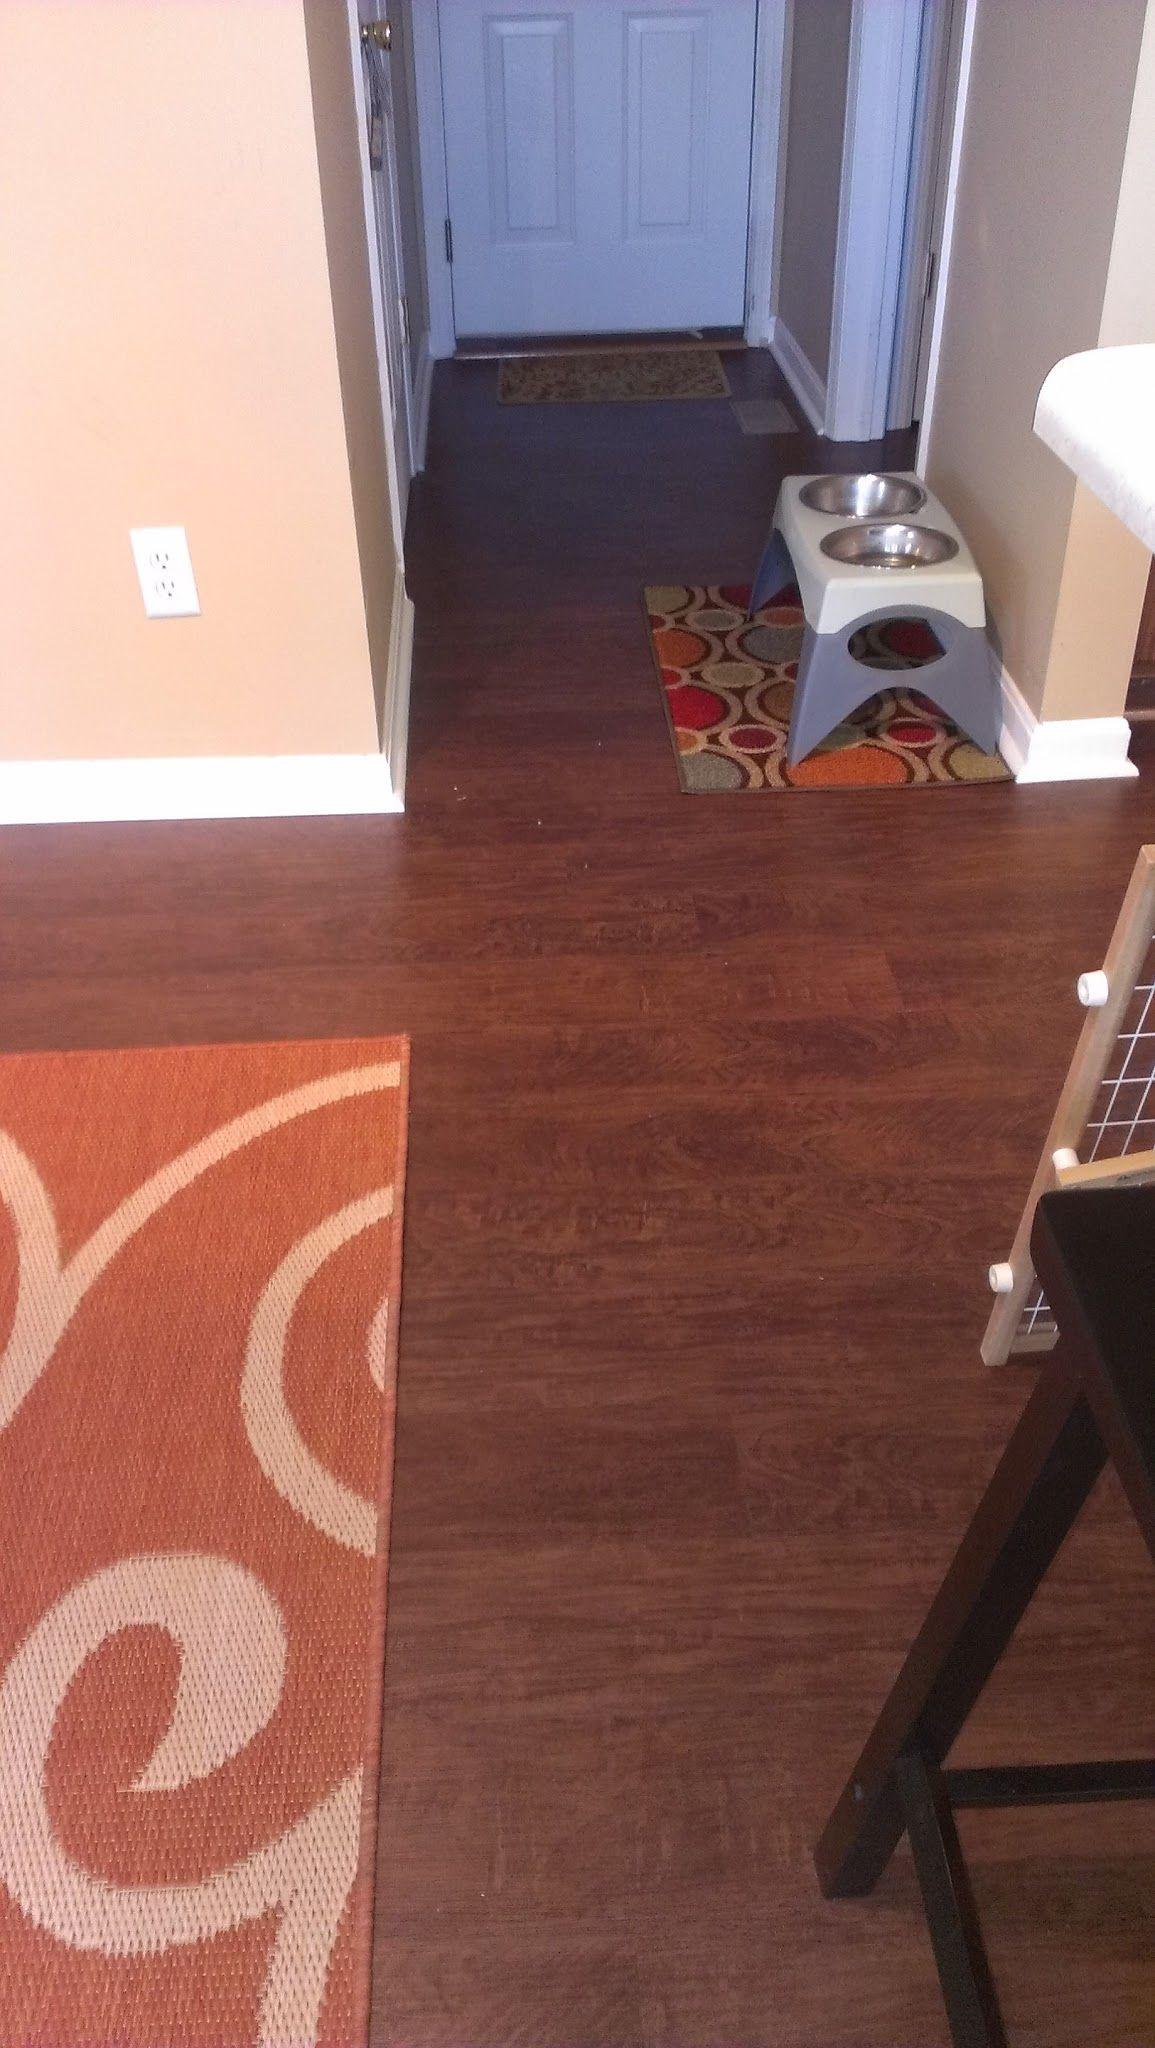 Nafco luxury vinyl plank flooring installed in kitchen in Trenton